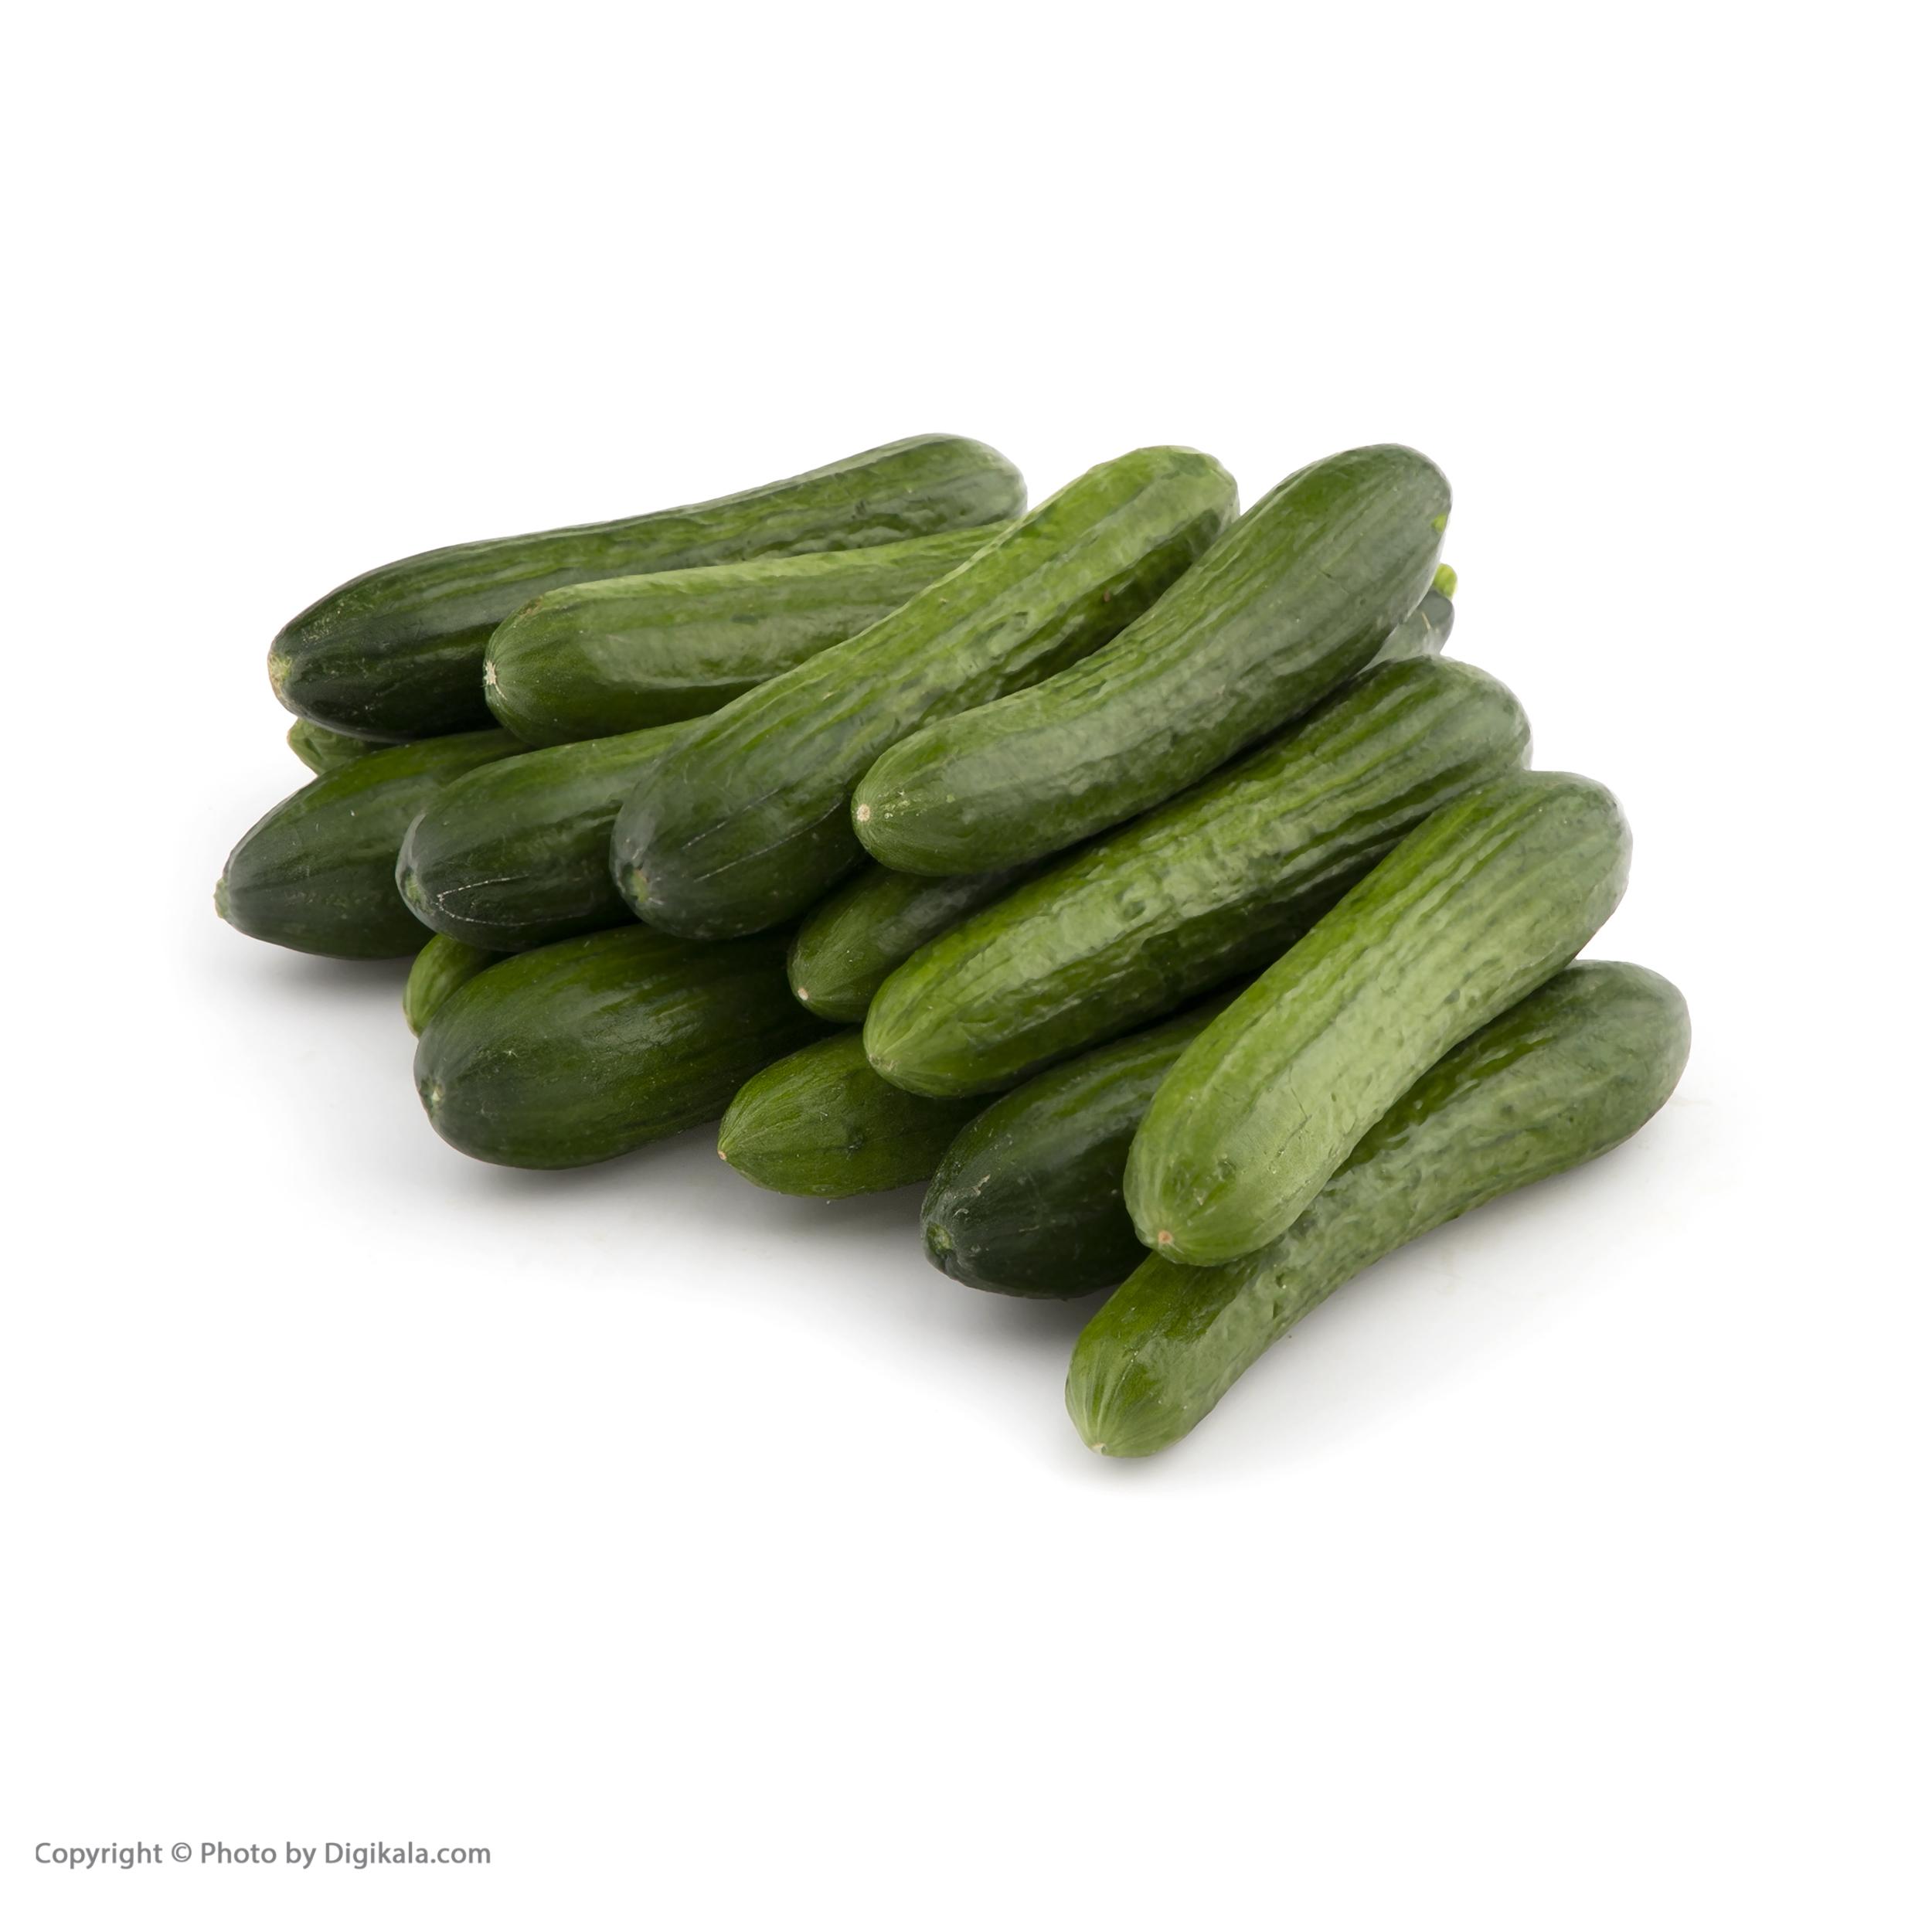 خیار گلخانه ای میوه پلاس - 1 کیلوگرم main 1 7